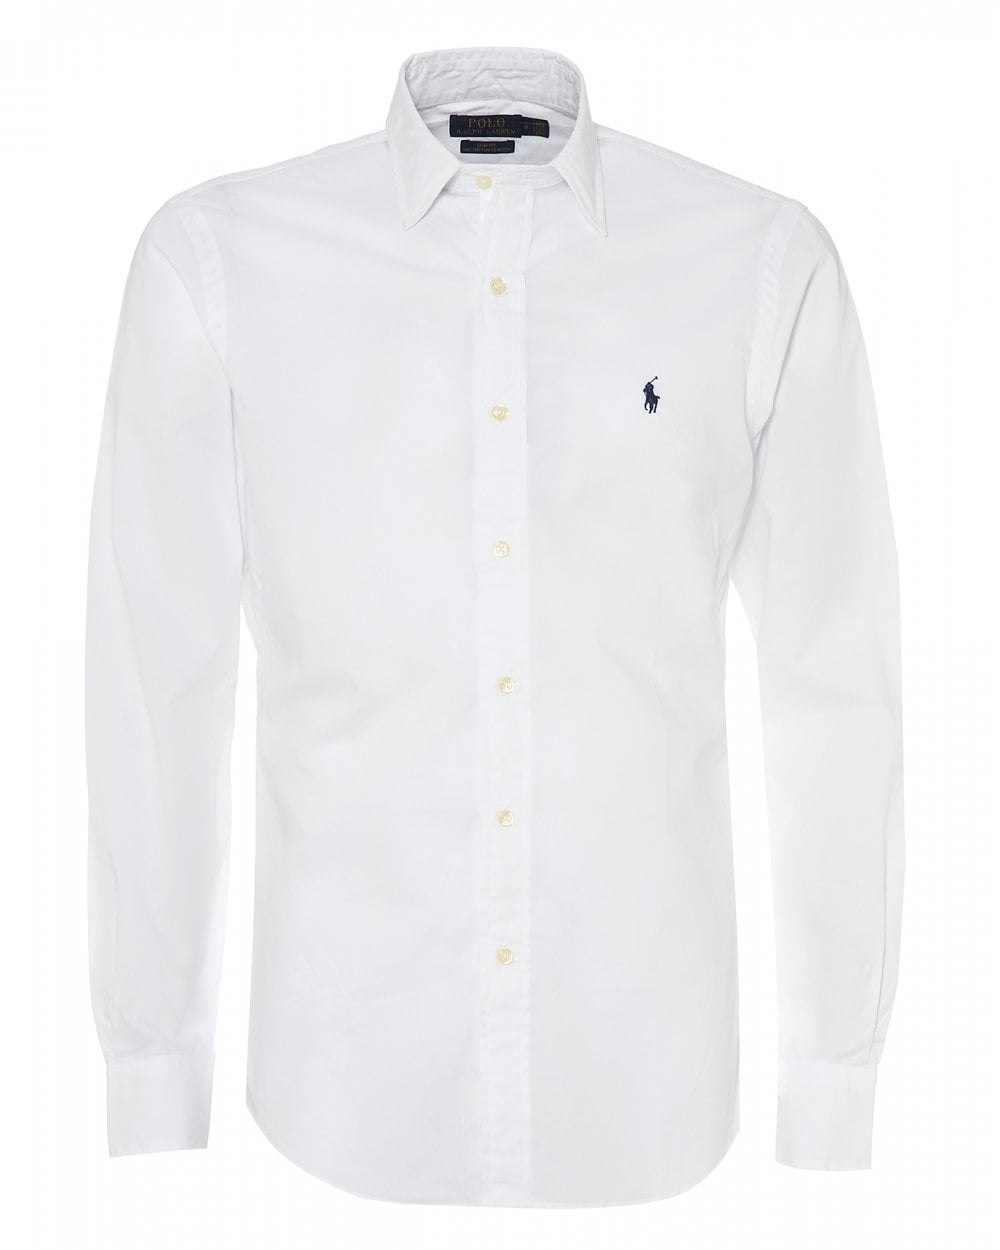 046392b6b5372 Ralph Lauren Mens Luxury Oxford Shirt